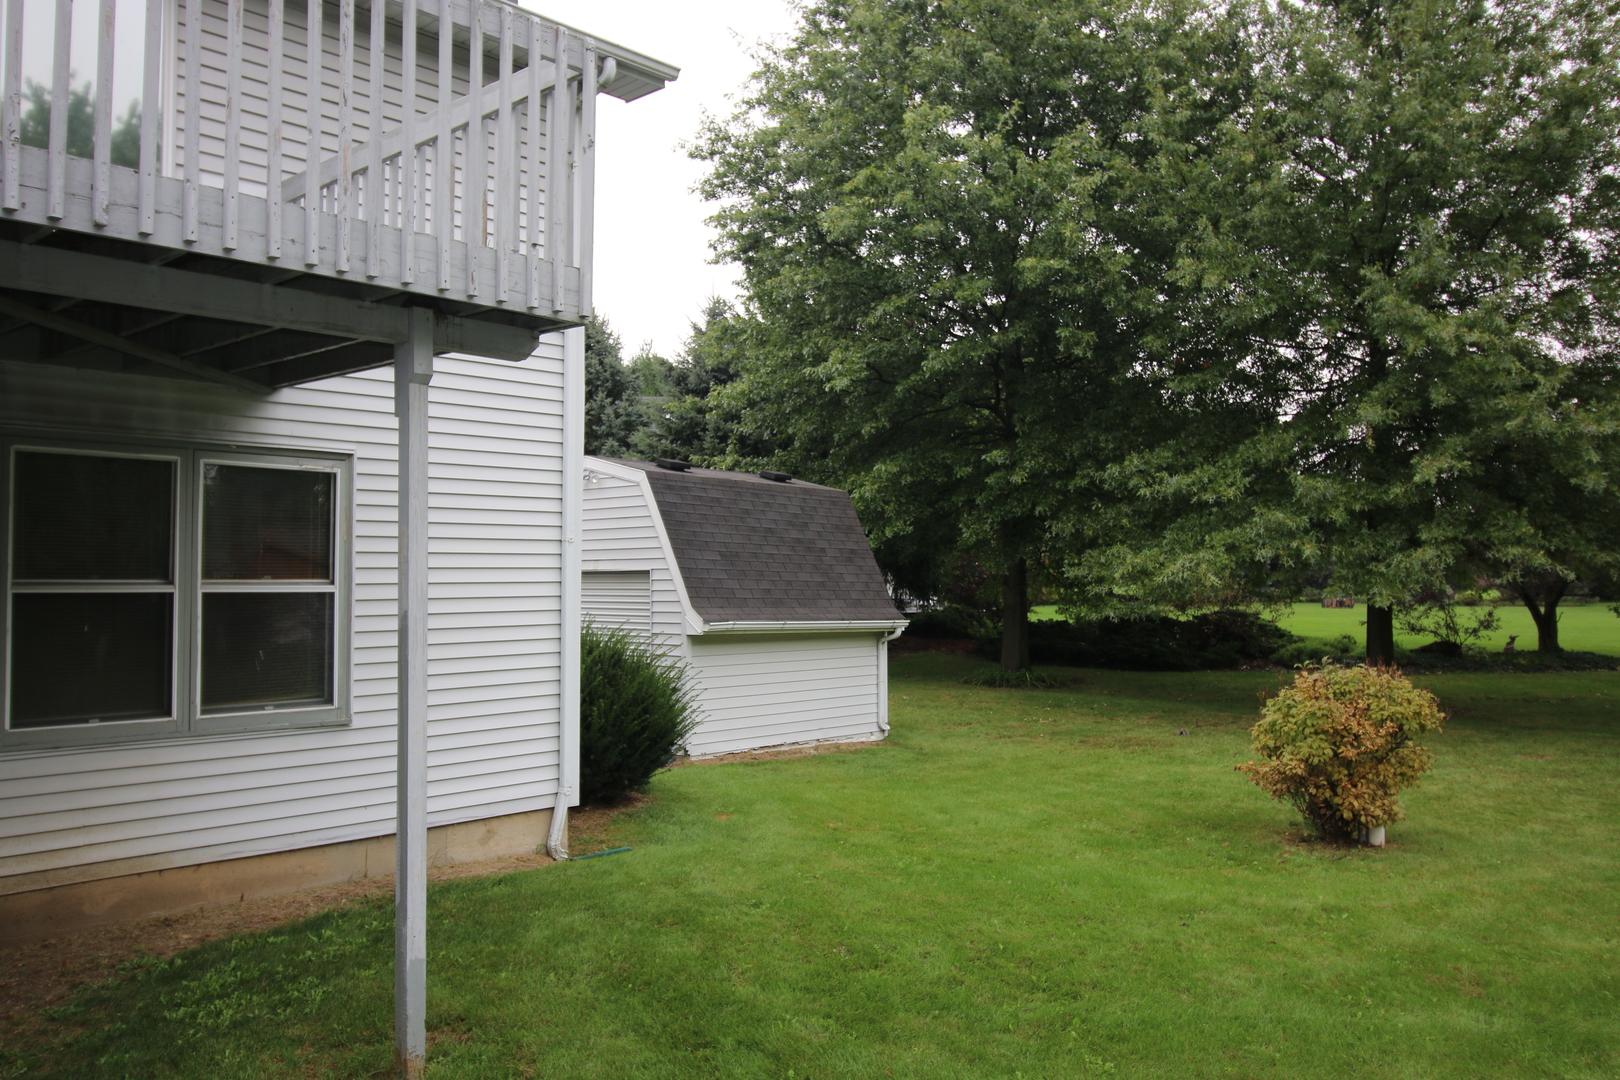 9709 Dale, Spring Grove, Illinois, 60081